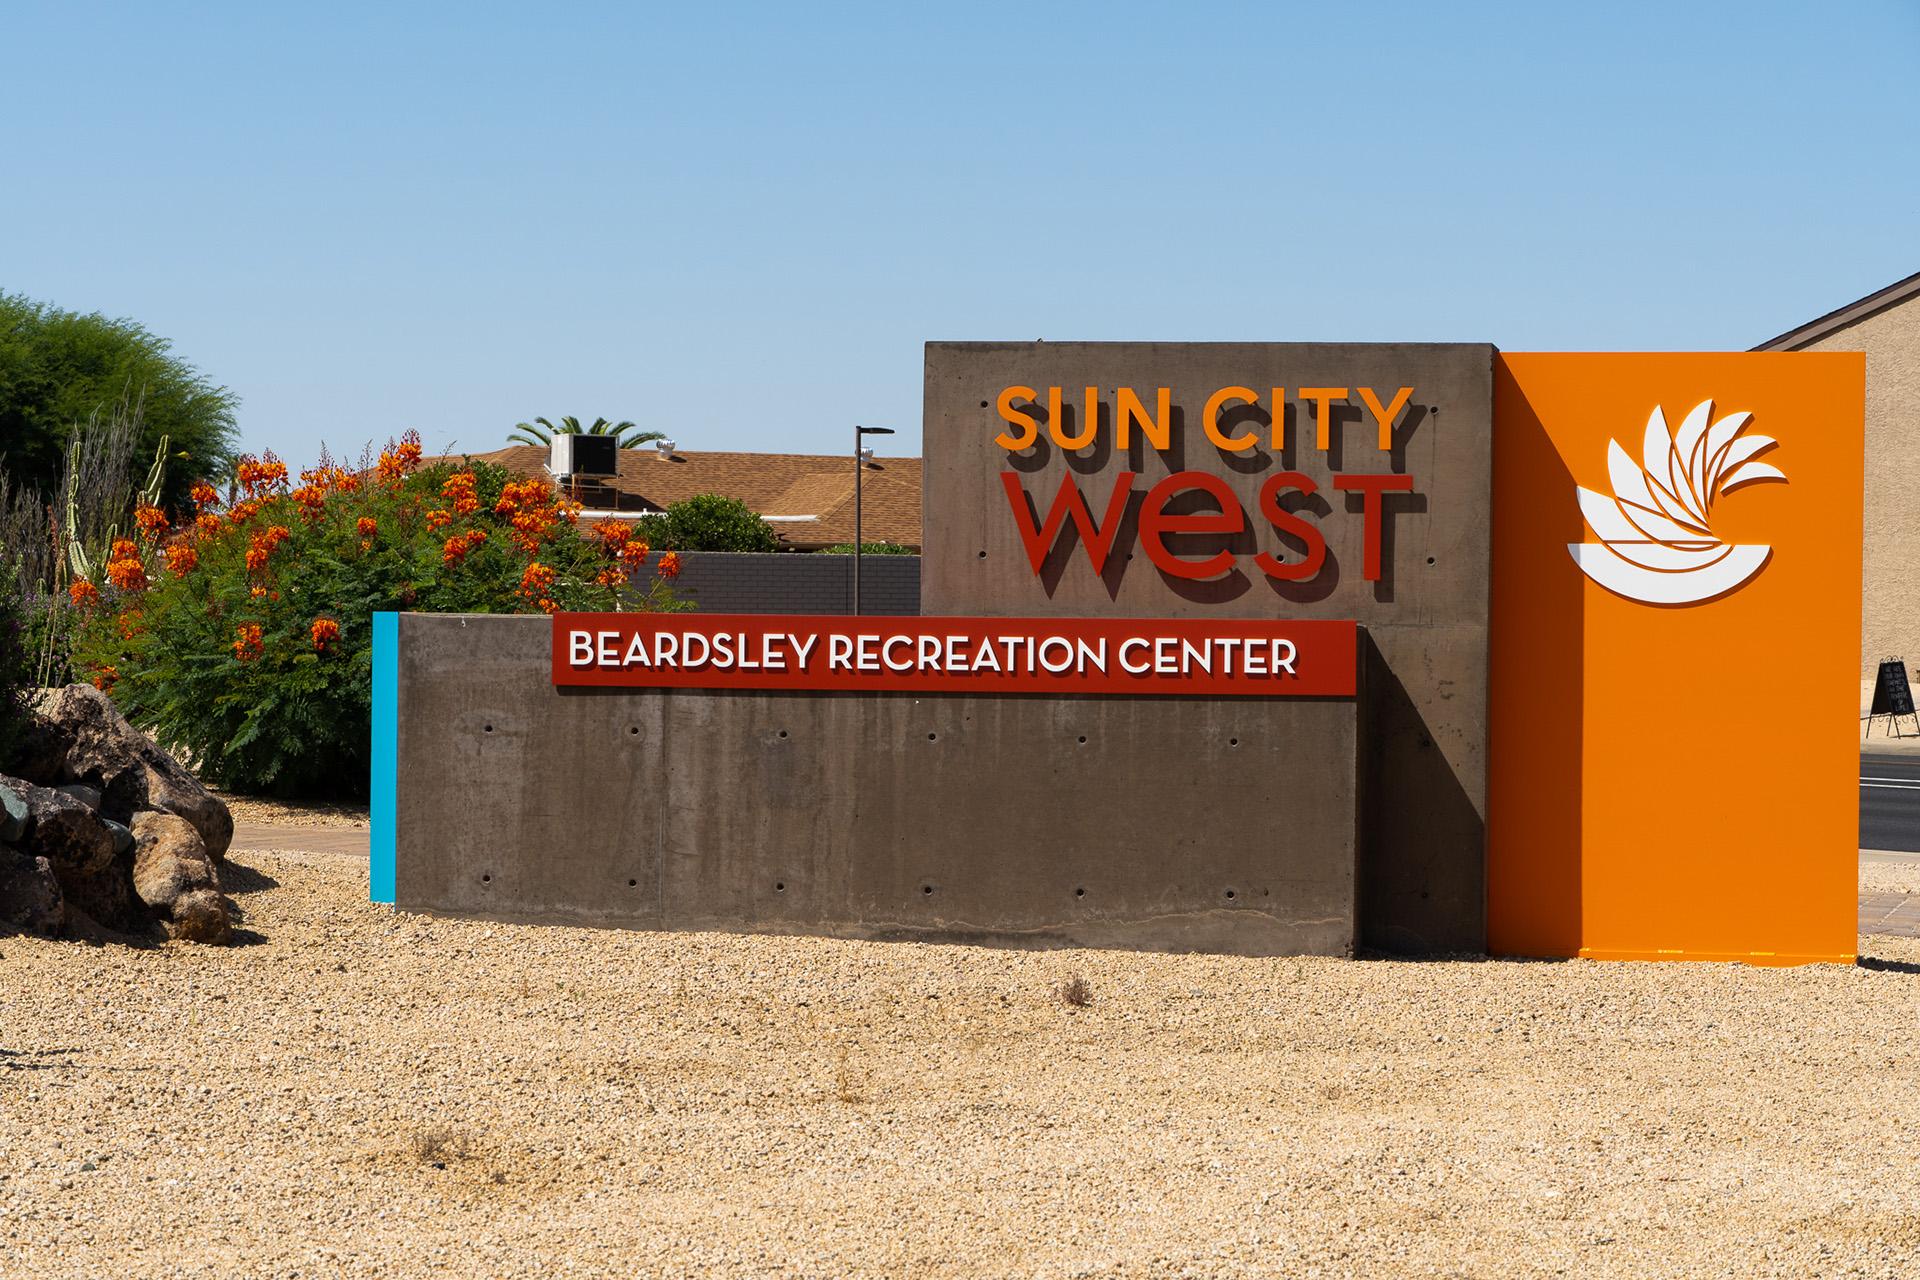 Beardsley Recreation Center